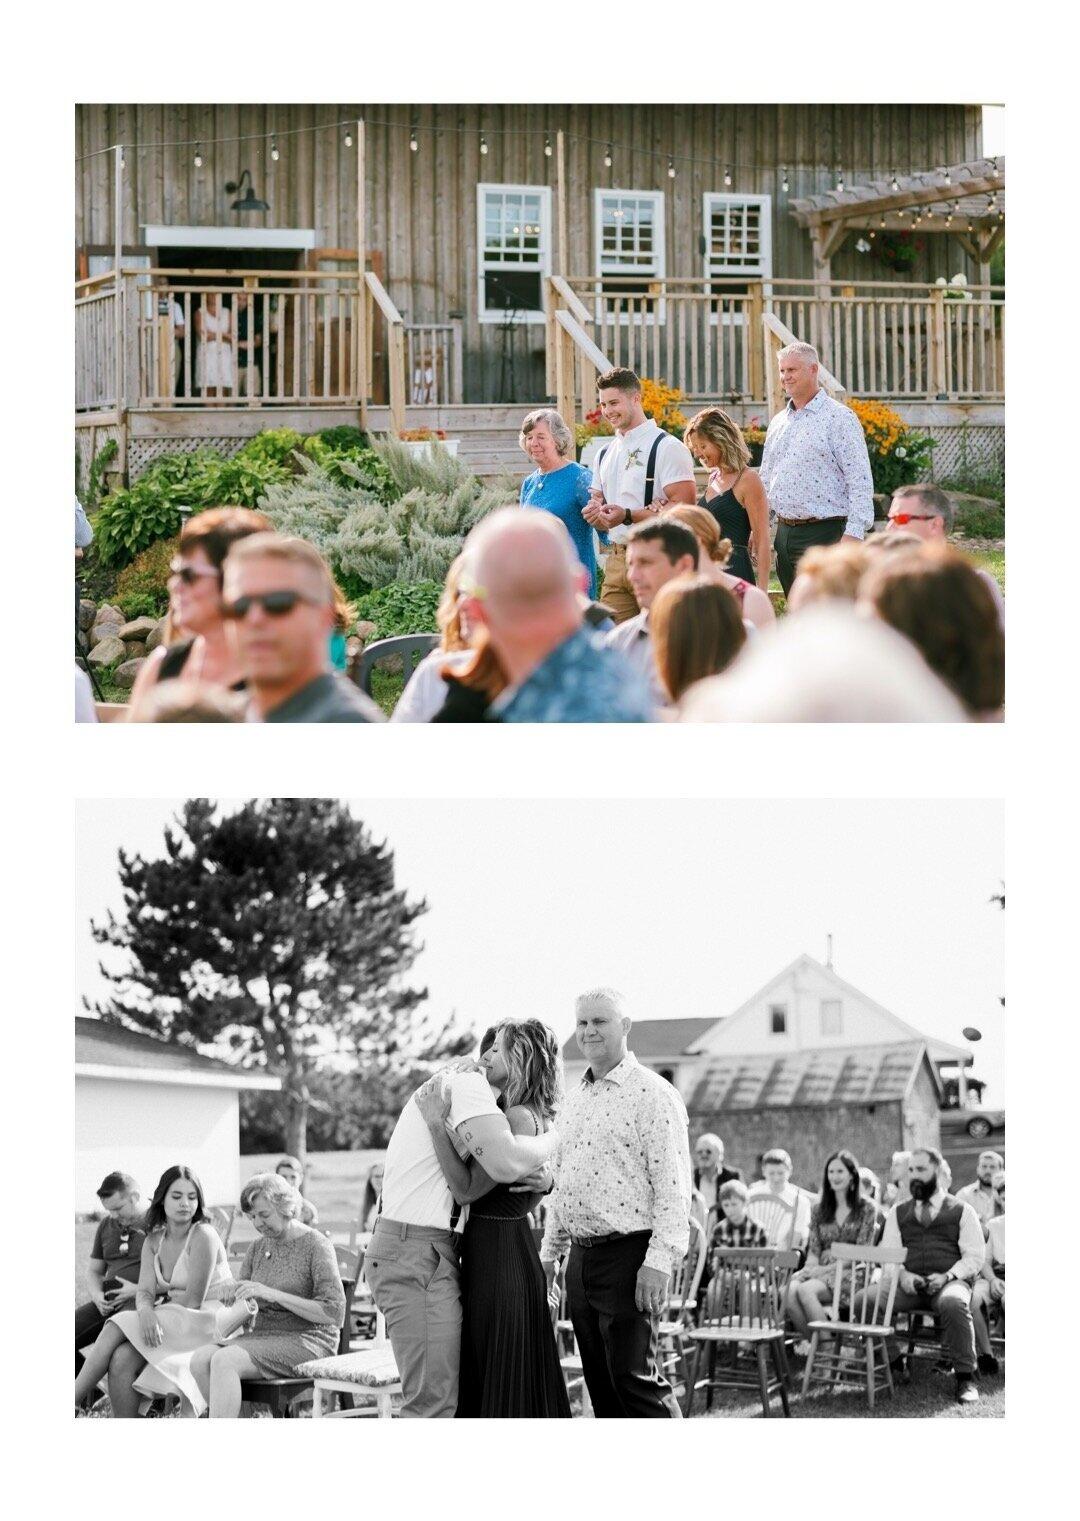 Jill+%26+Talon%3A+Wedding+Day+Previews+%7C+Halifax+Wedding+Photographer